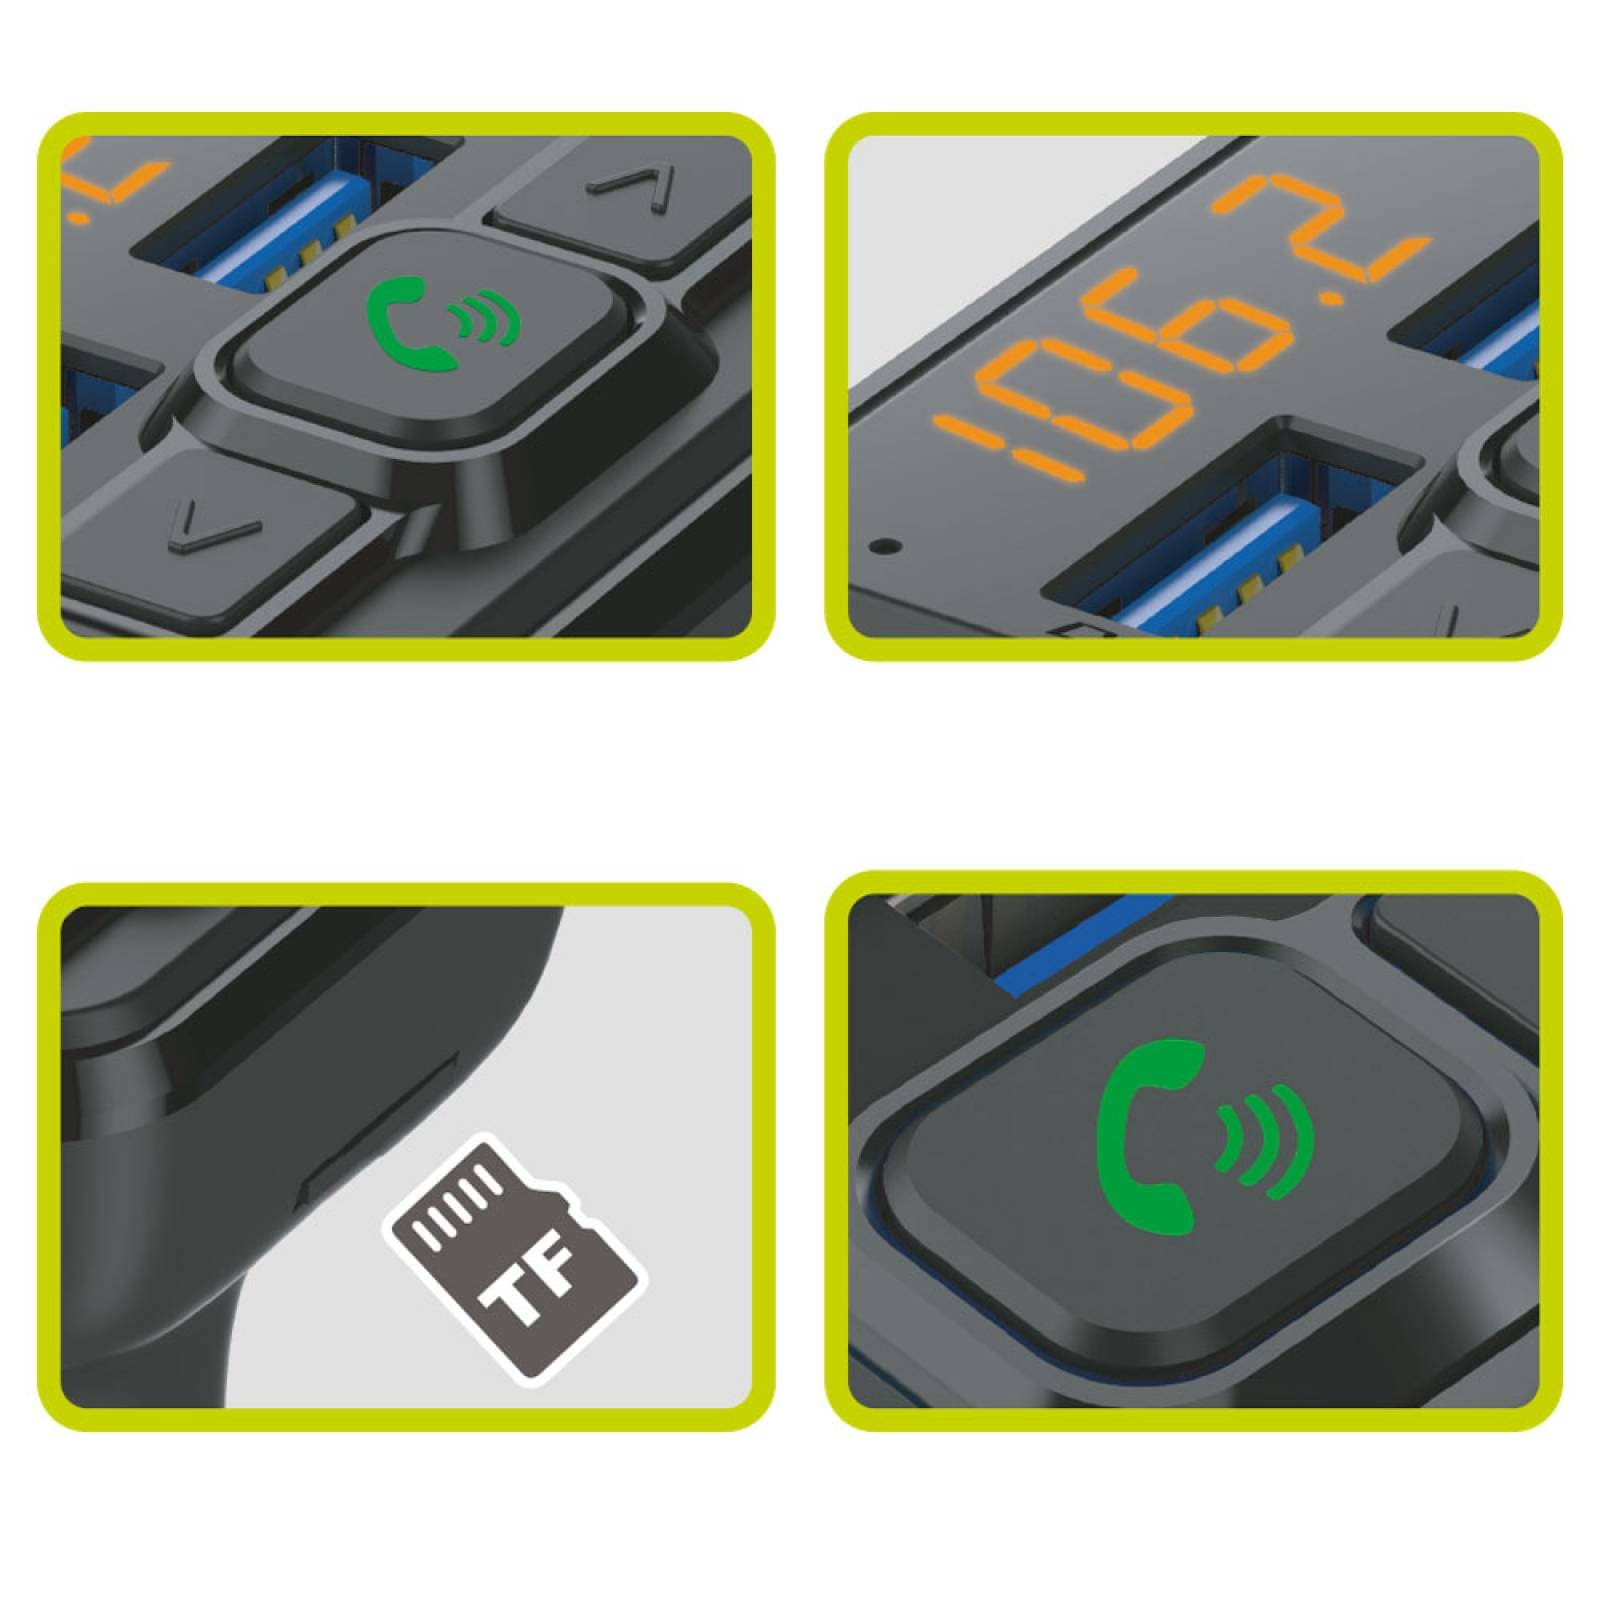 Transmisor Bluetooth Kit Manos Libres cargador Usb HF-BT80